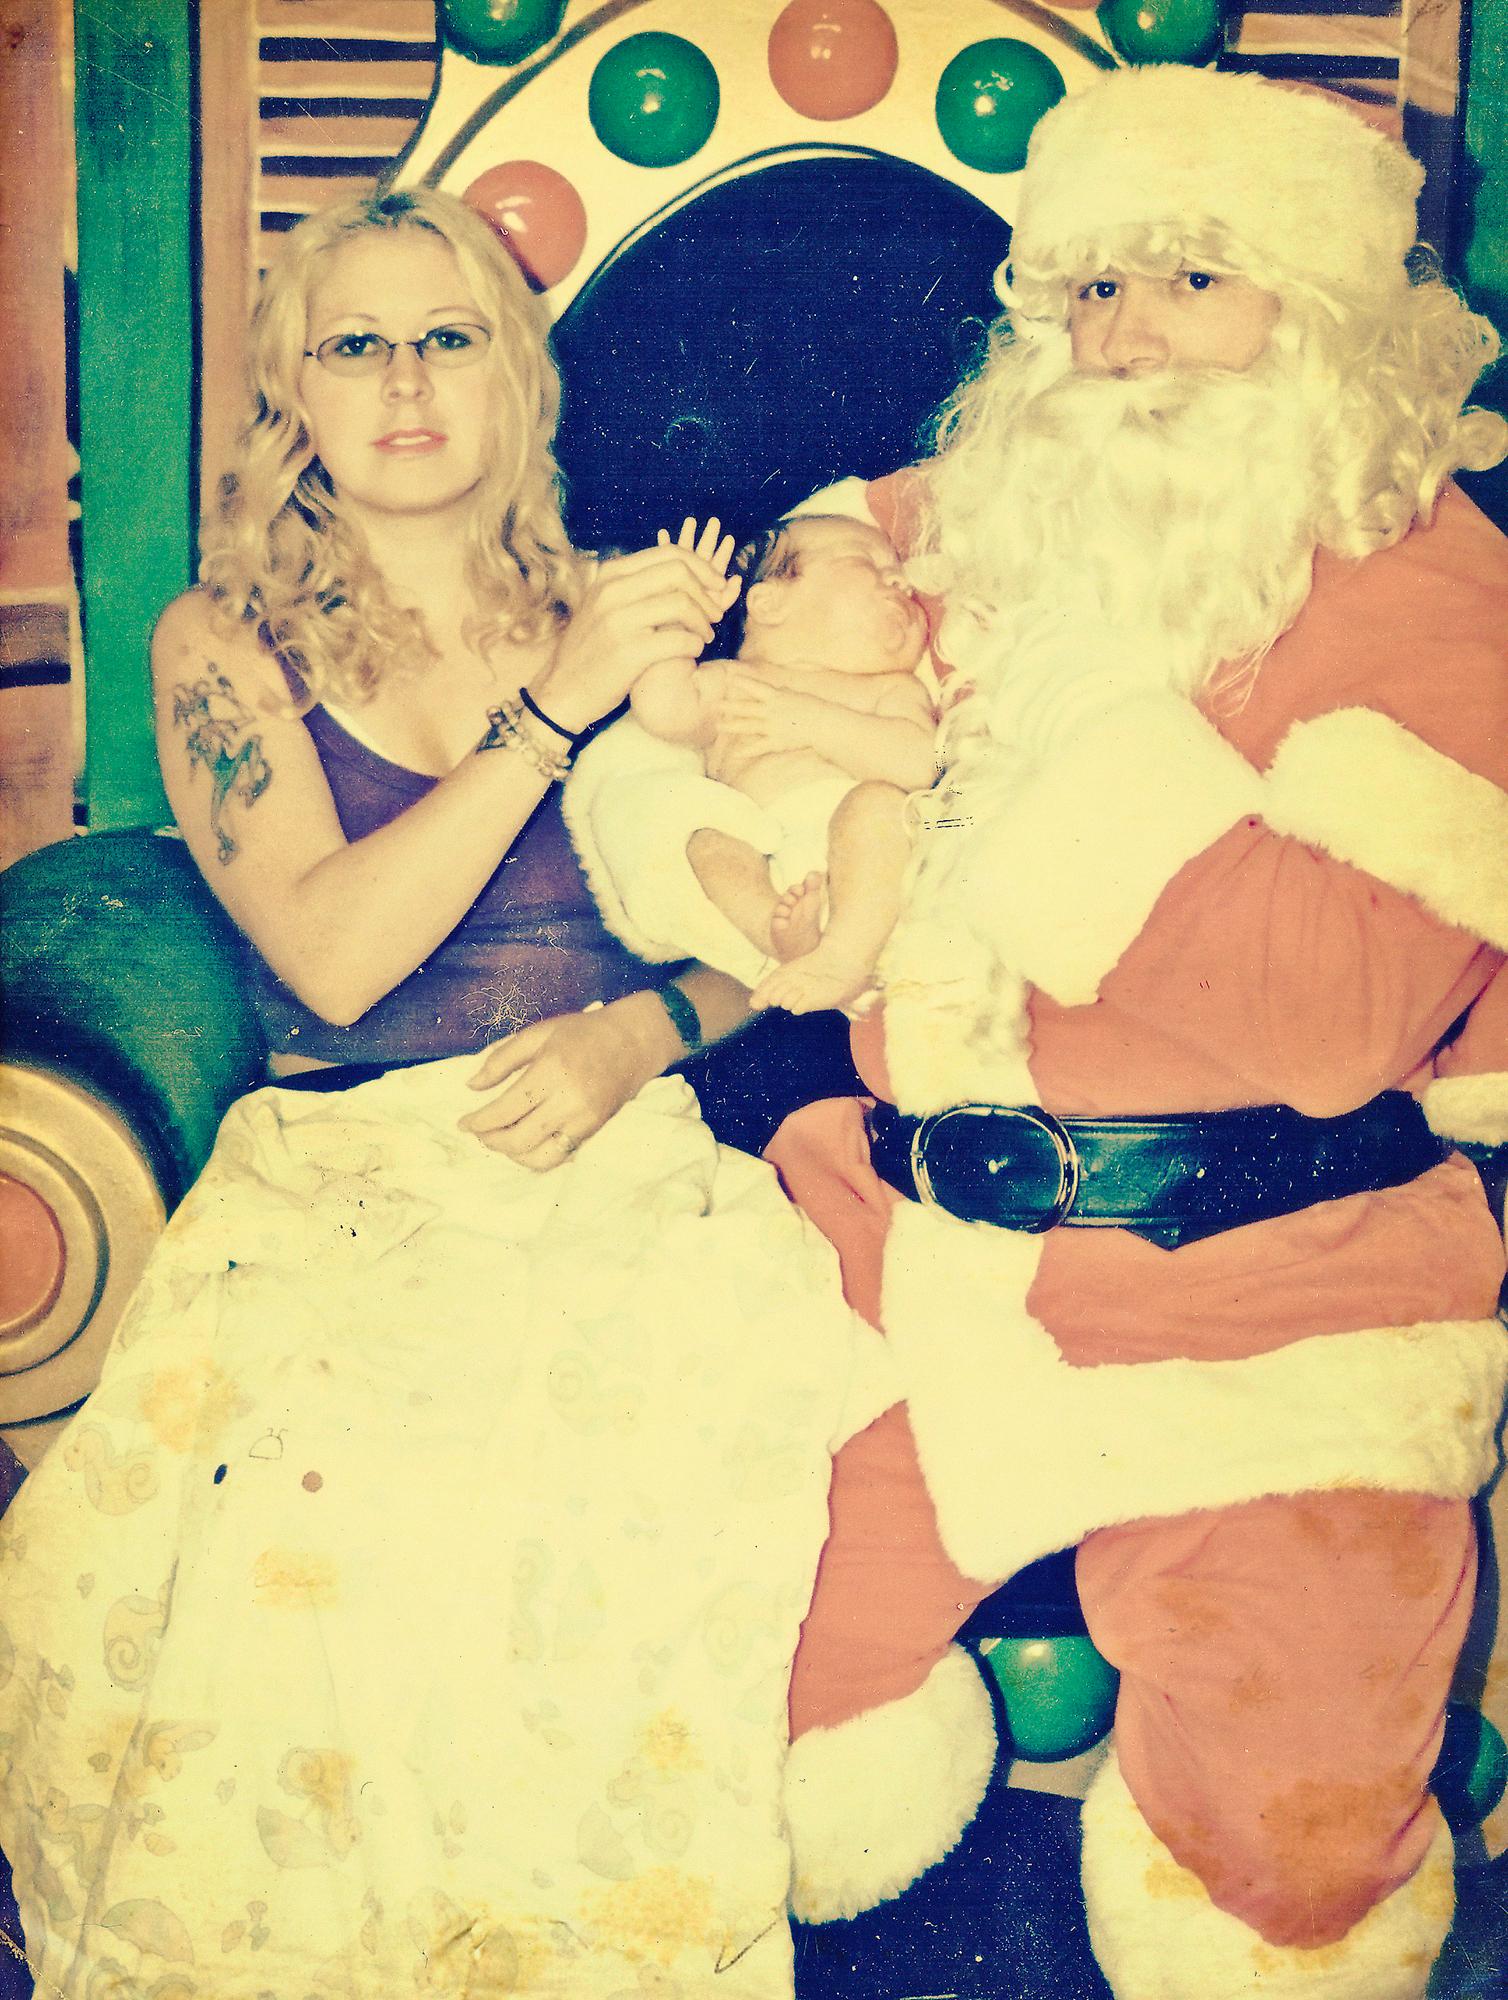 Christmas 02 by AbsurdWordPreferred